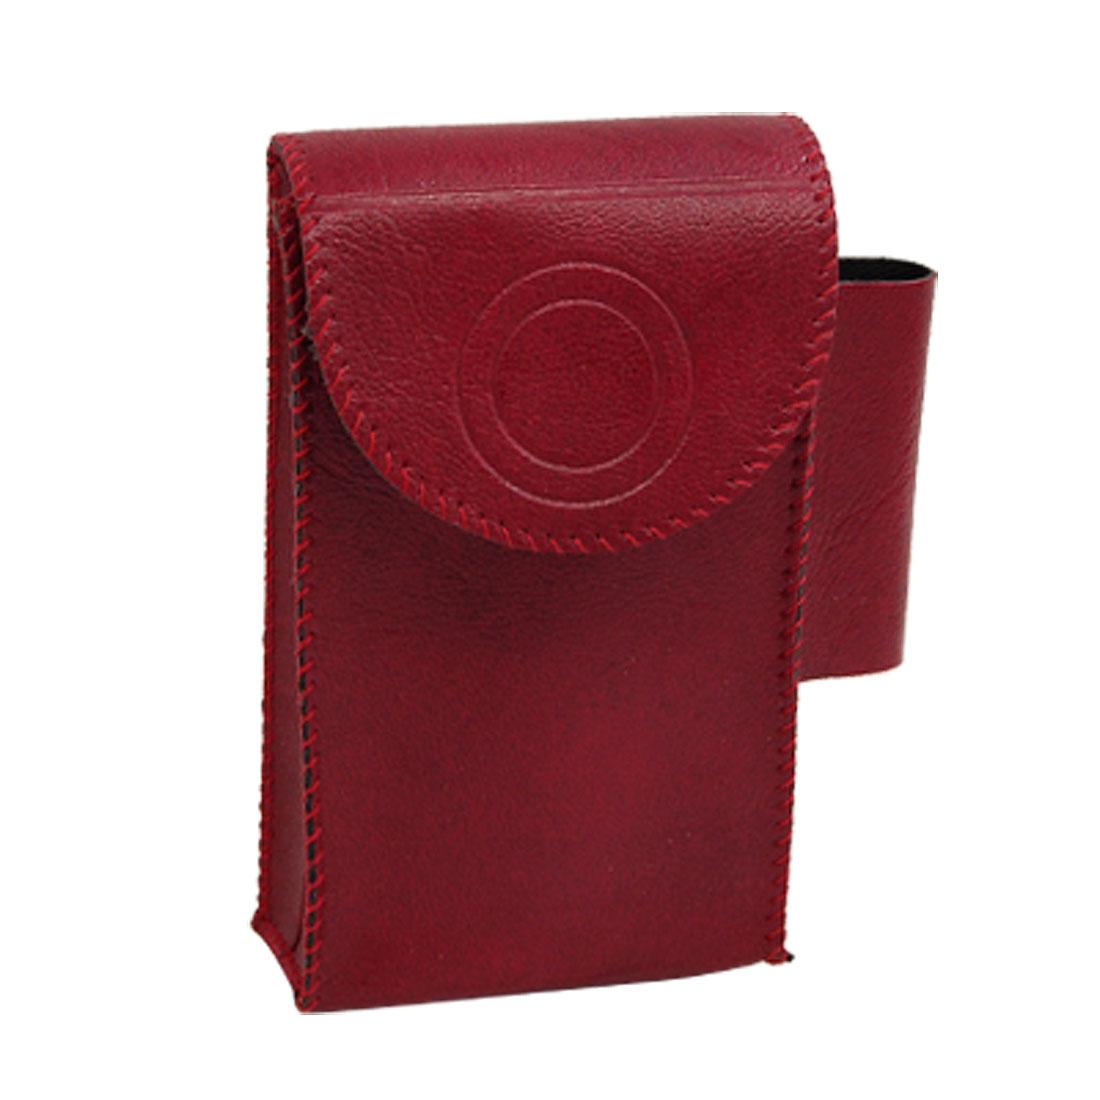 Cigarette Cigars Case + Lighter Holder 2 in 1 Bag Pouch Red